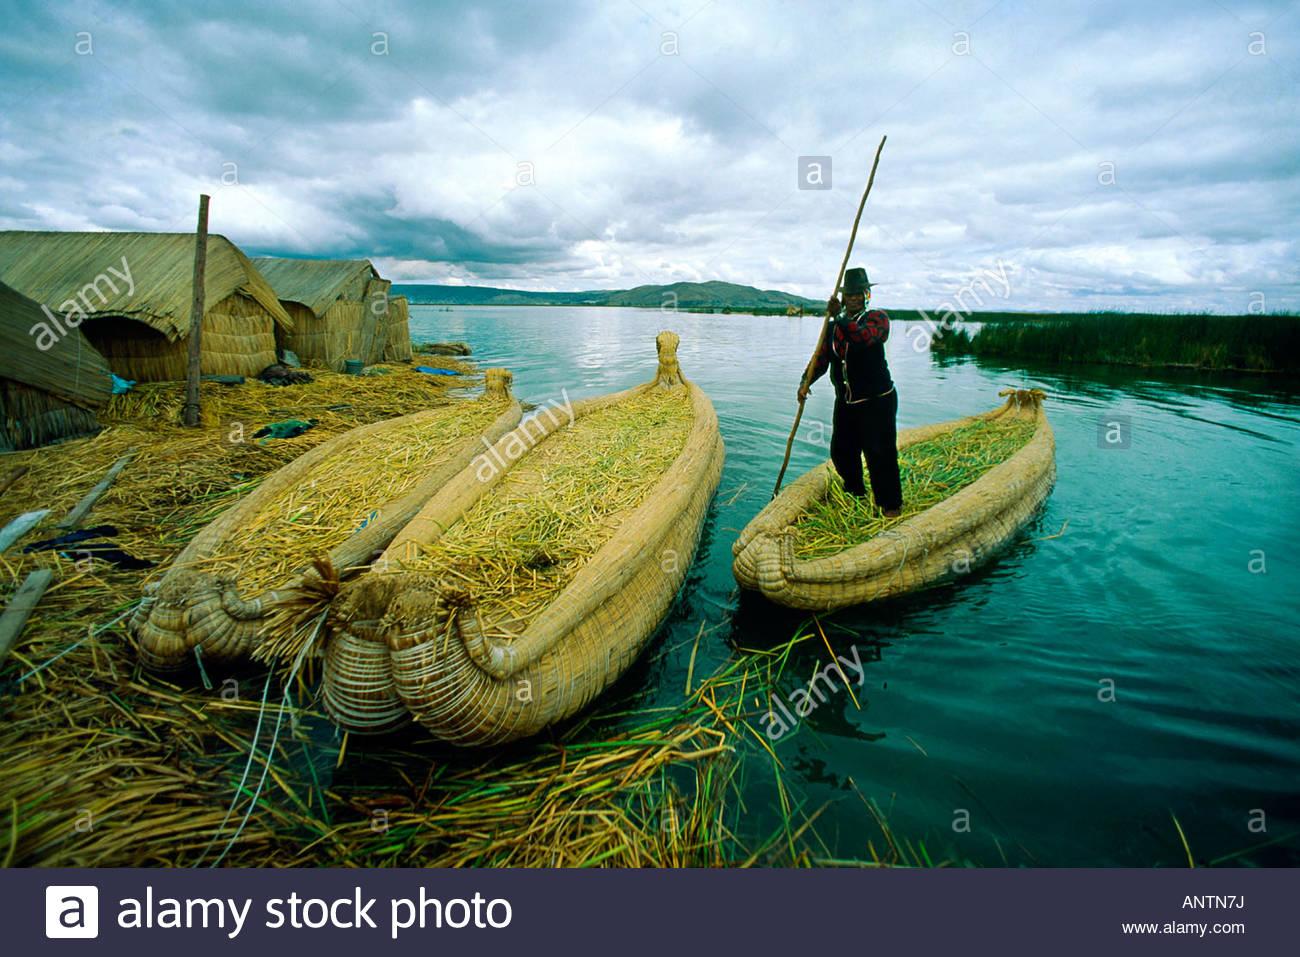 Reed boats of the Uro Indians on Santa Maria Island floating island Lake Titicaca Peru - Stock Image